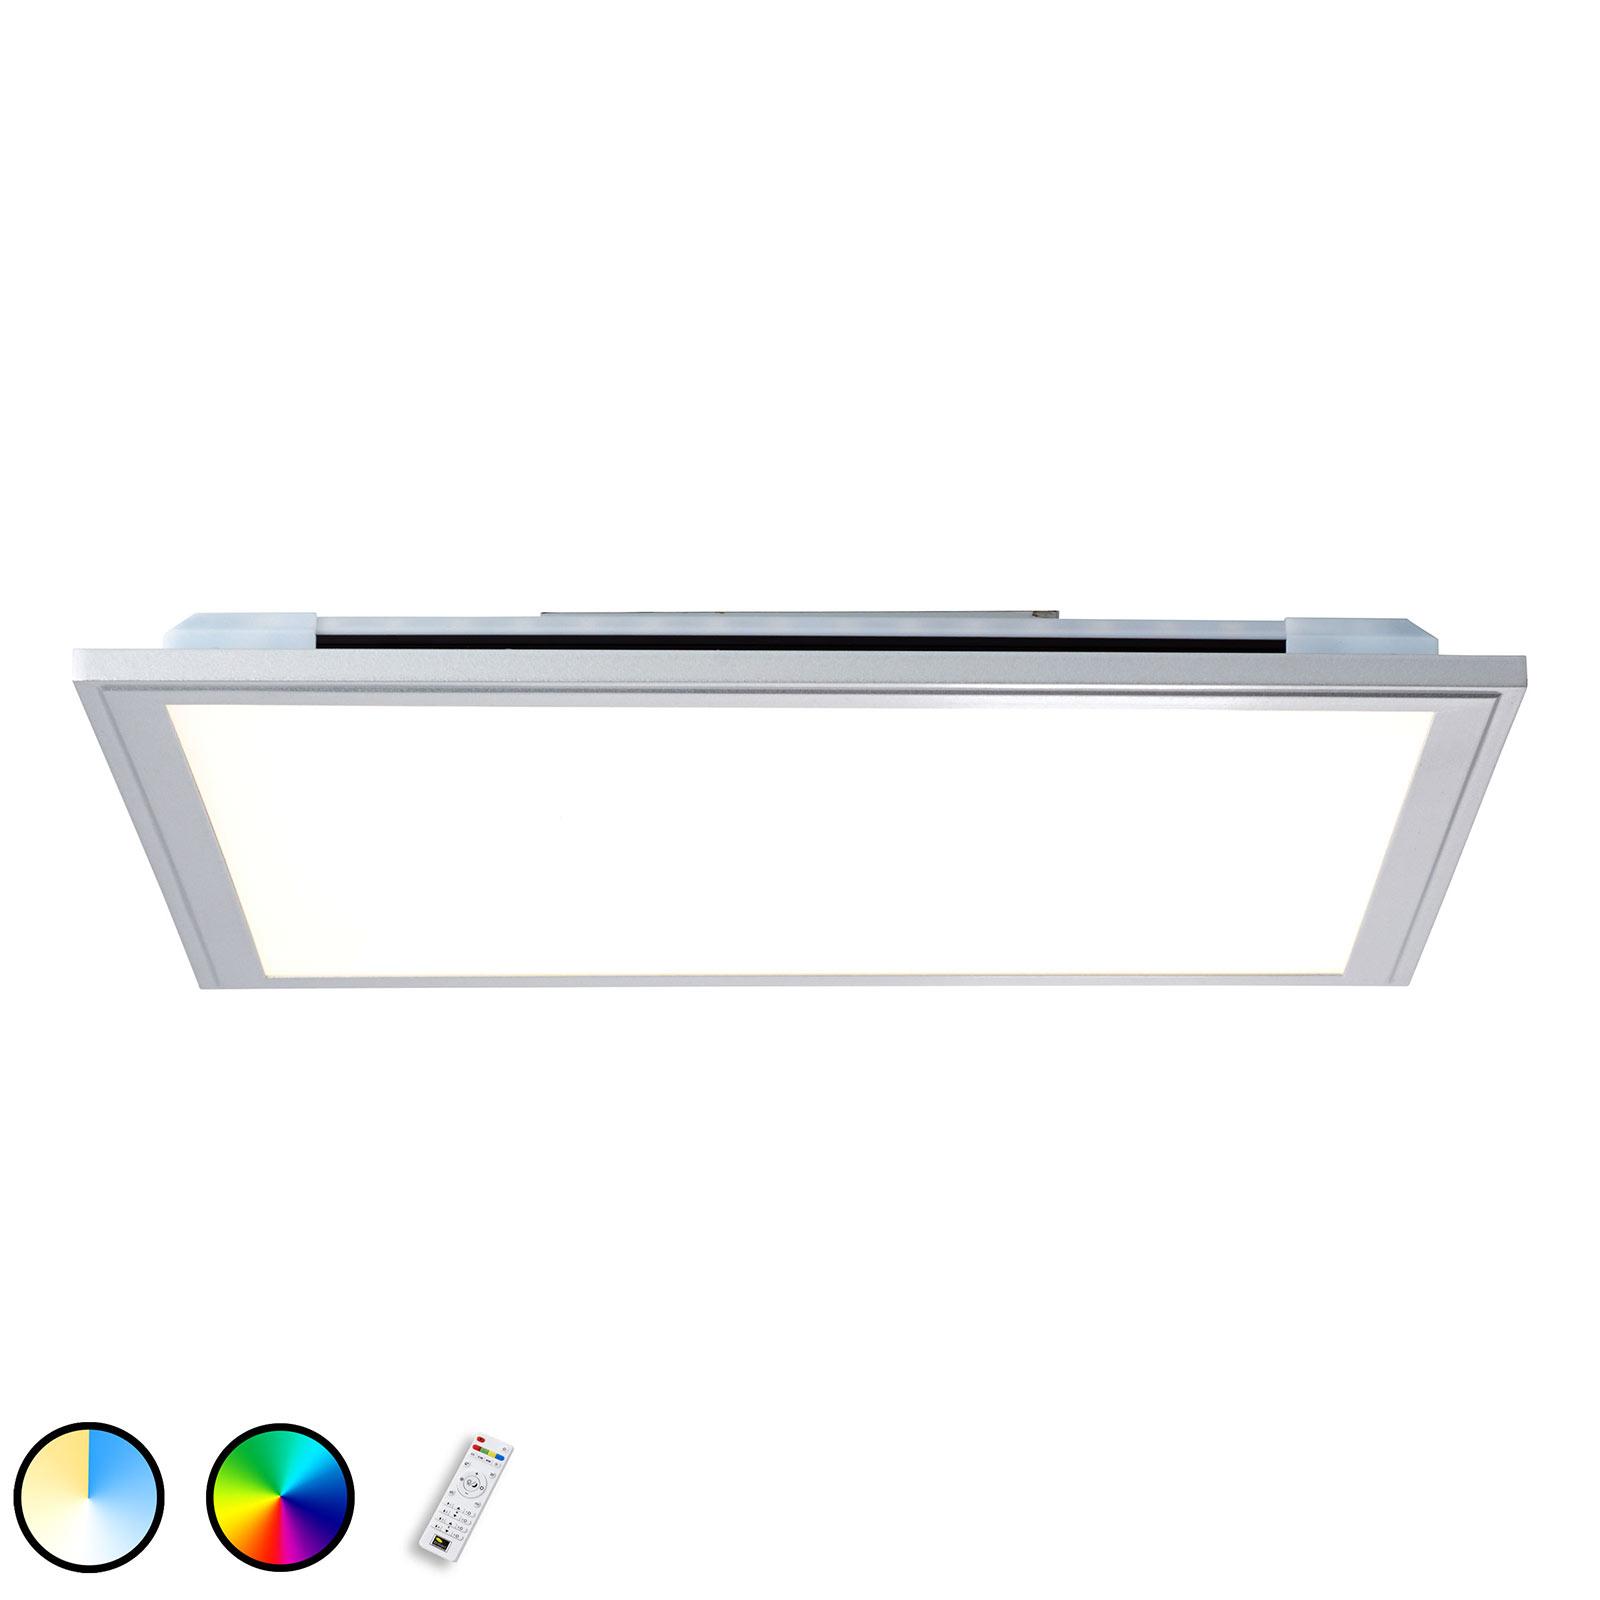 Lampa sufitowa LED Alissa, 59,5x59,5 cm